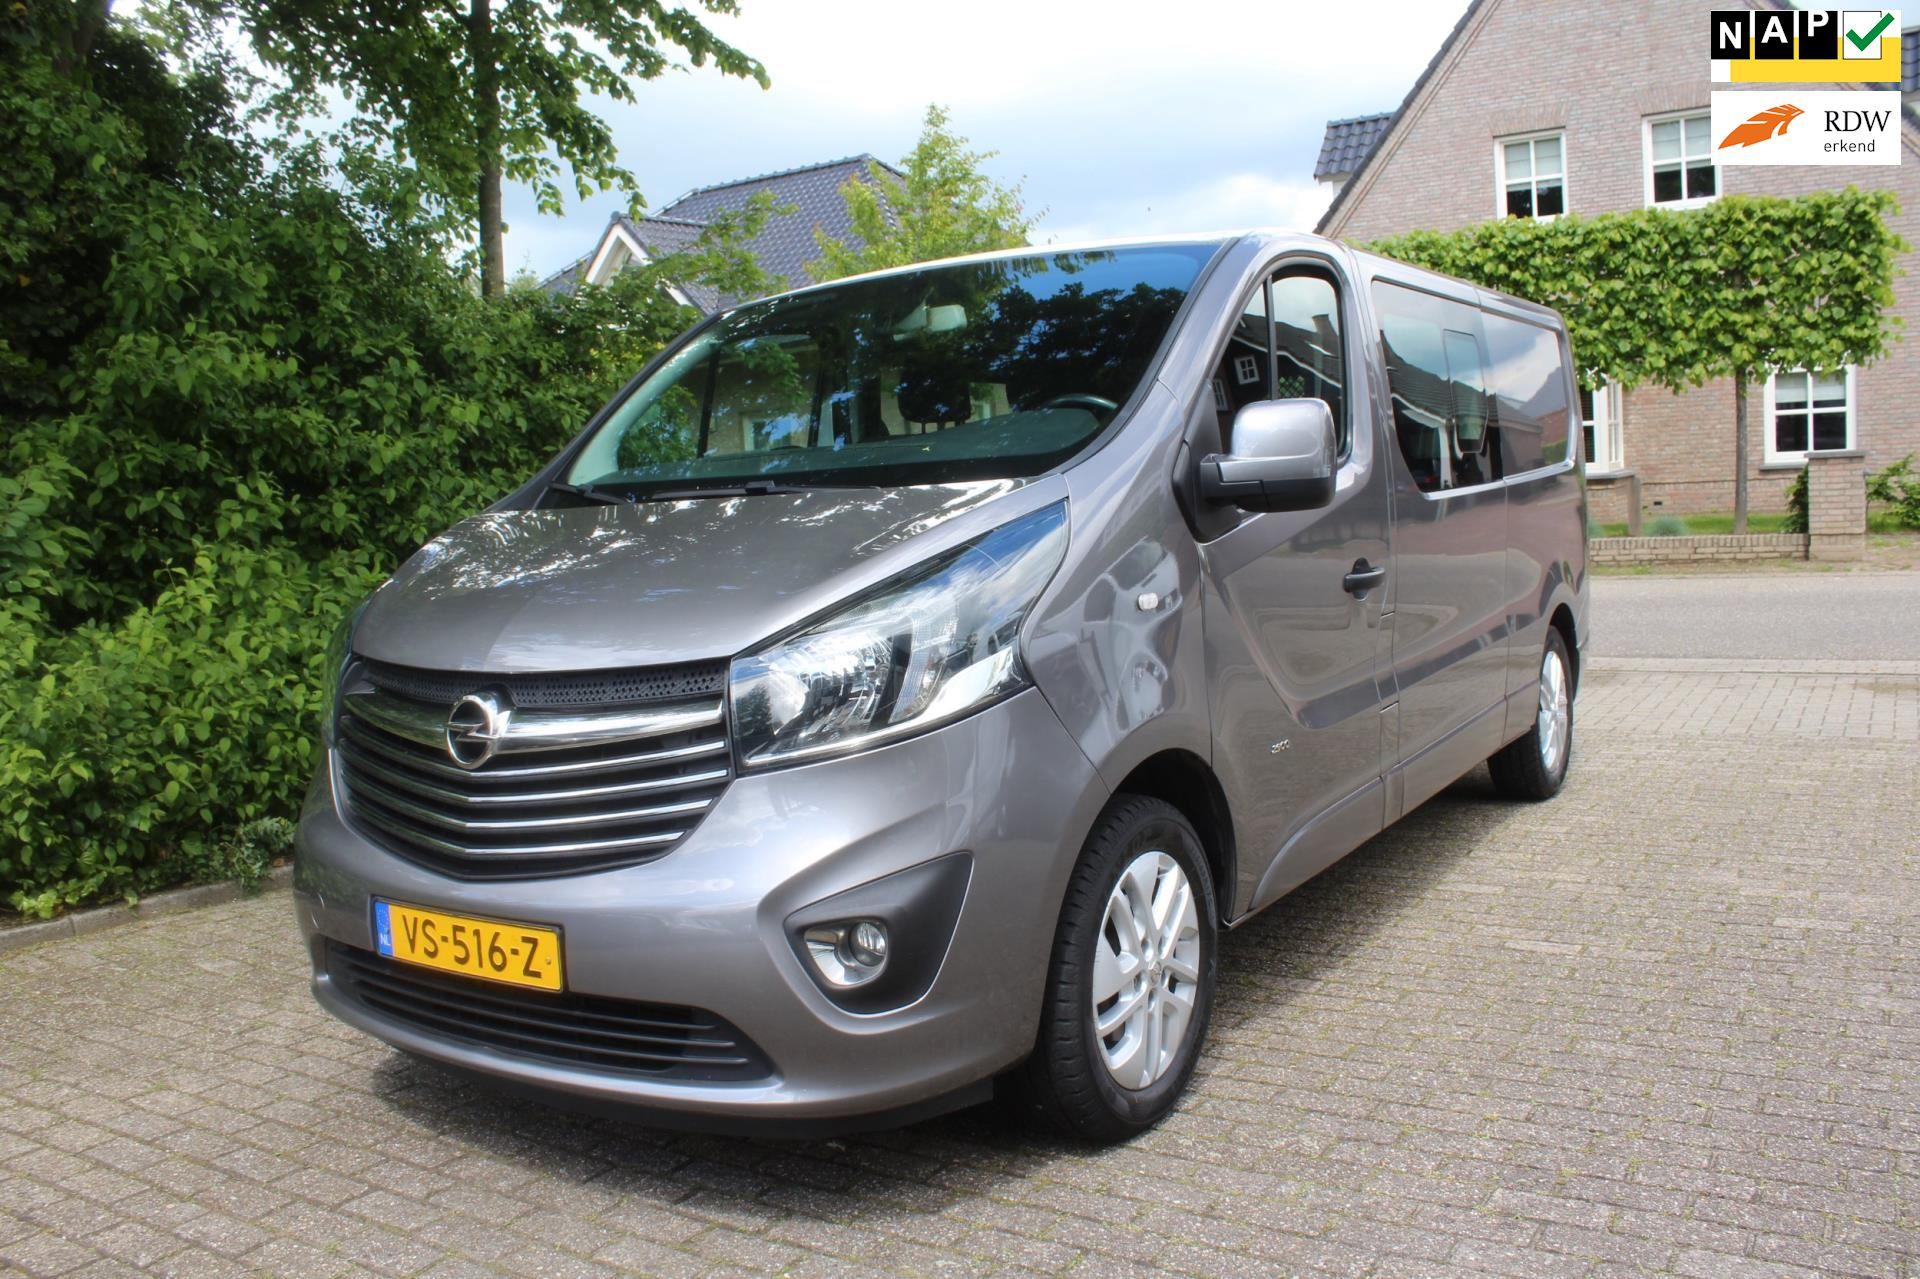 Opel Vivaro occasion - Autogroothandel Ammerzoden